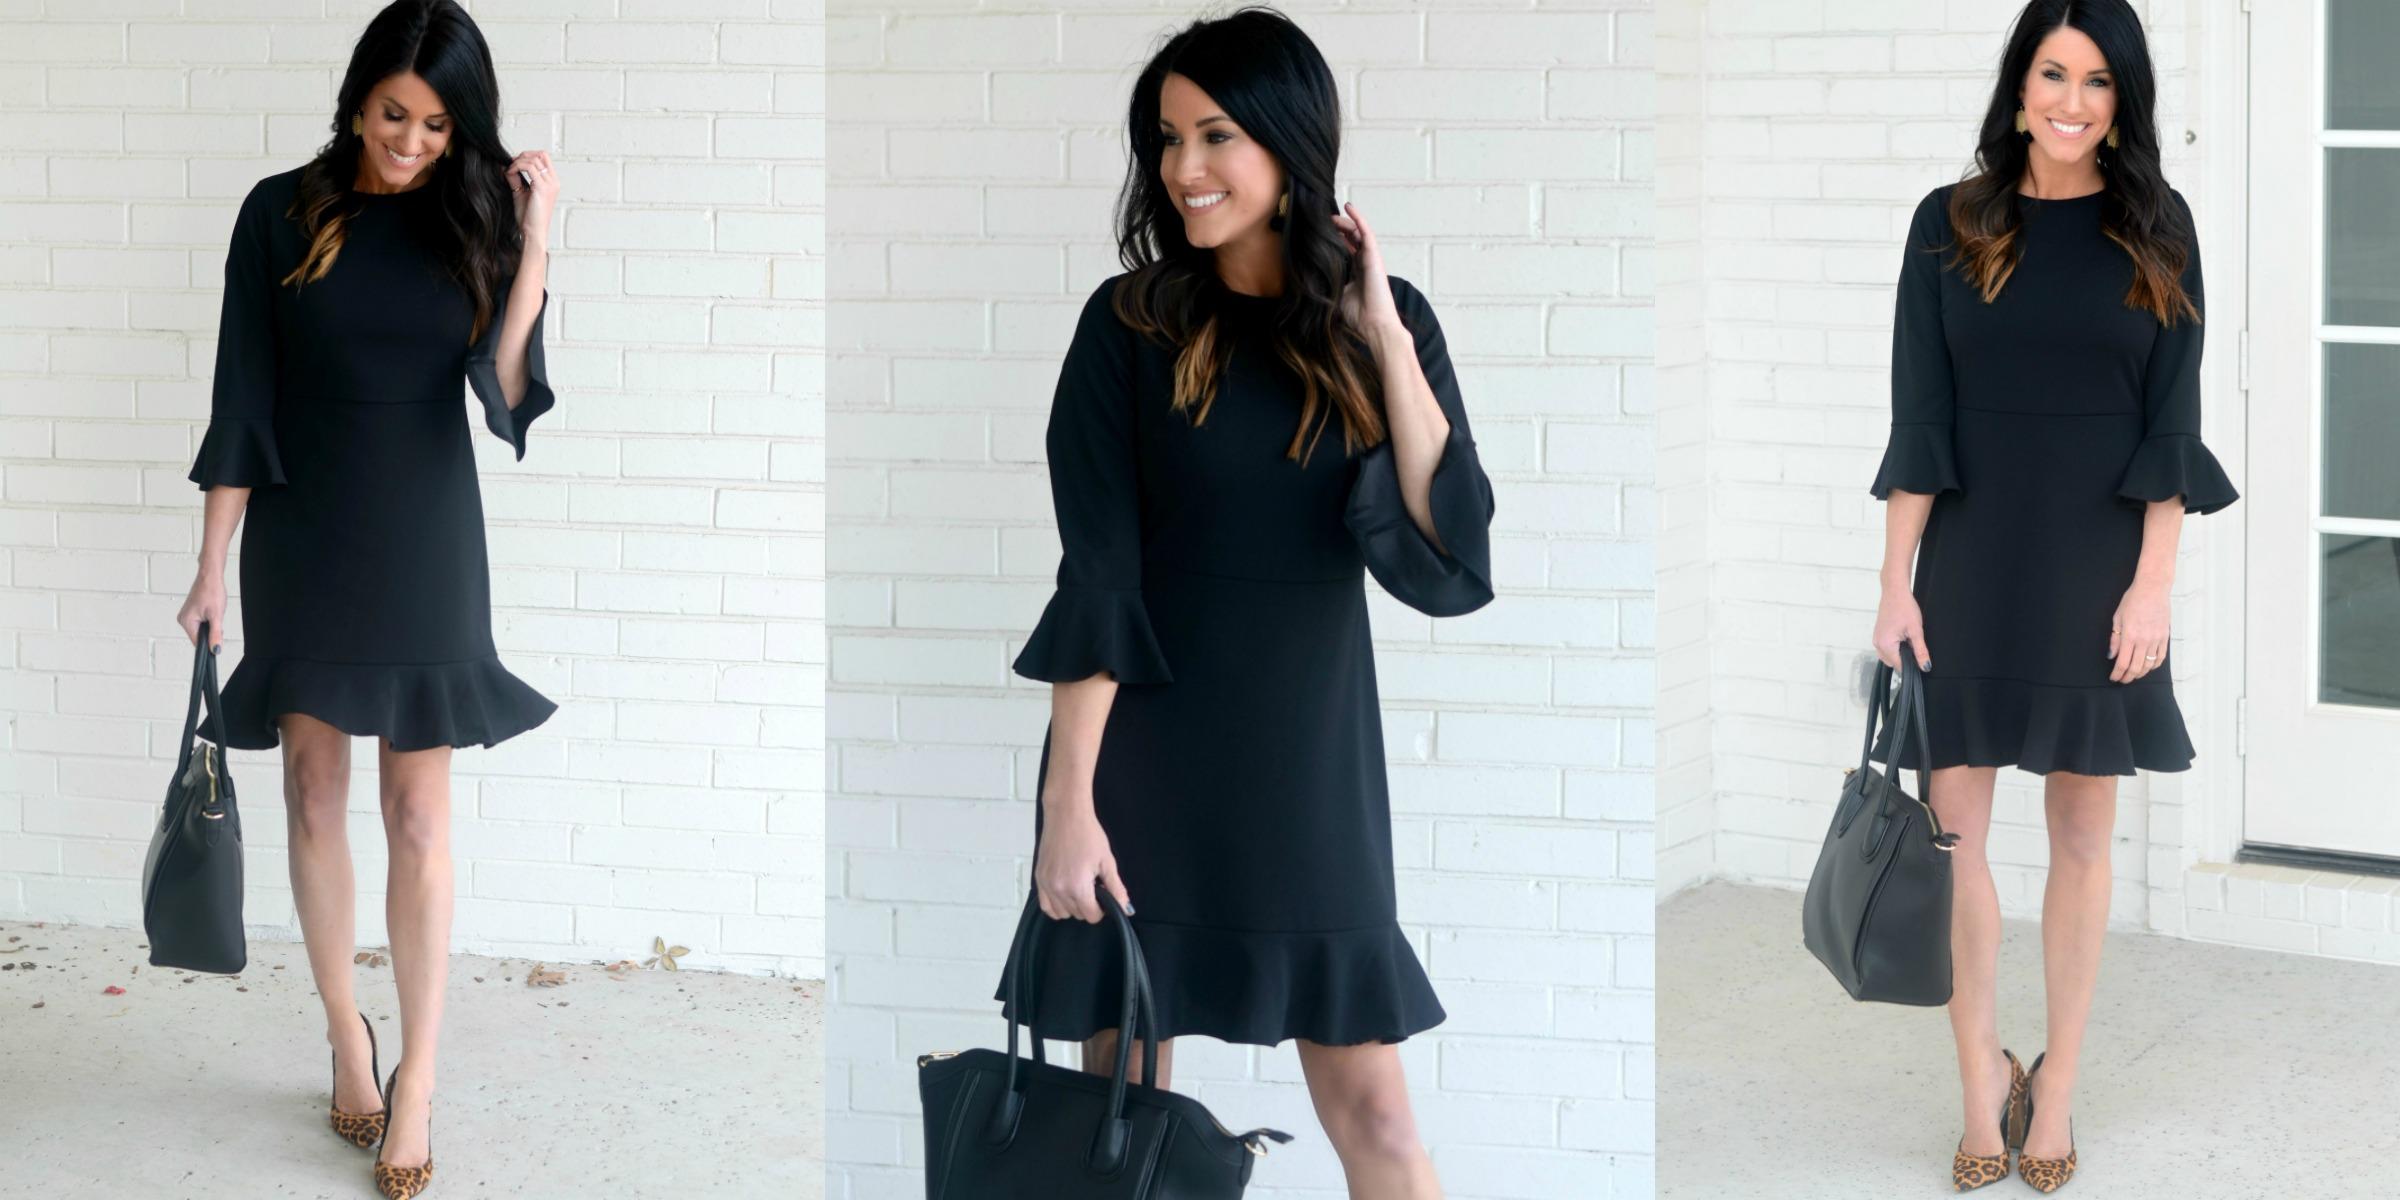 Black Dress and Leopard Heels